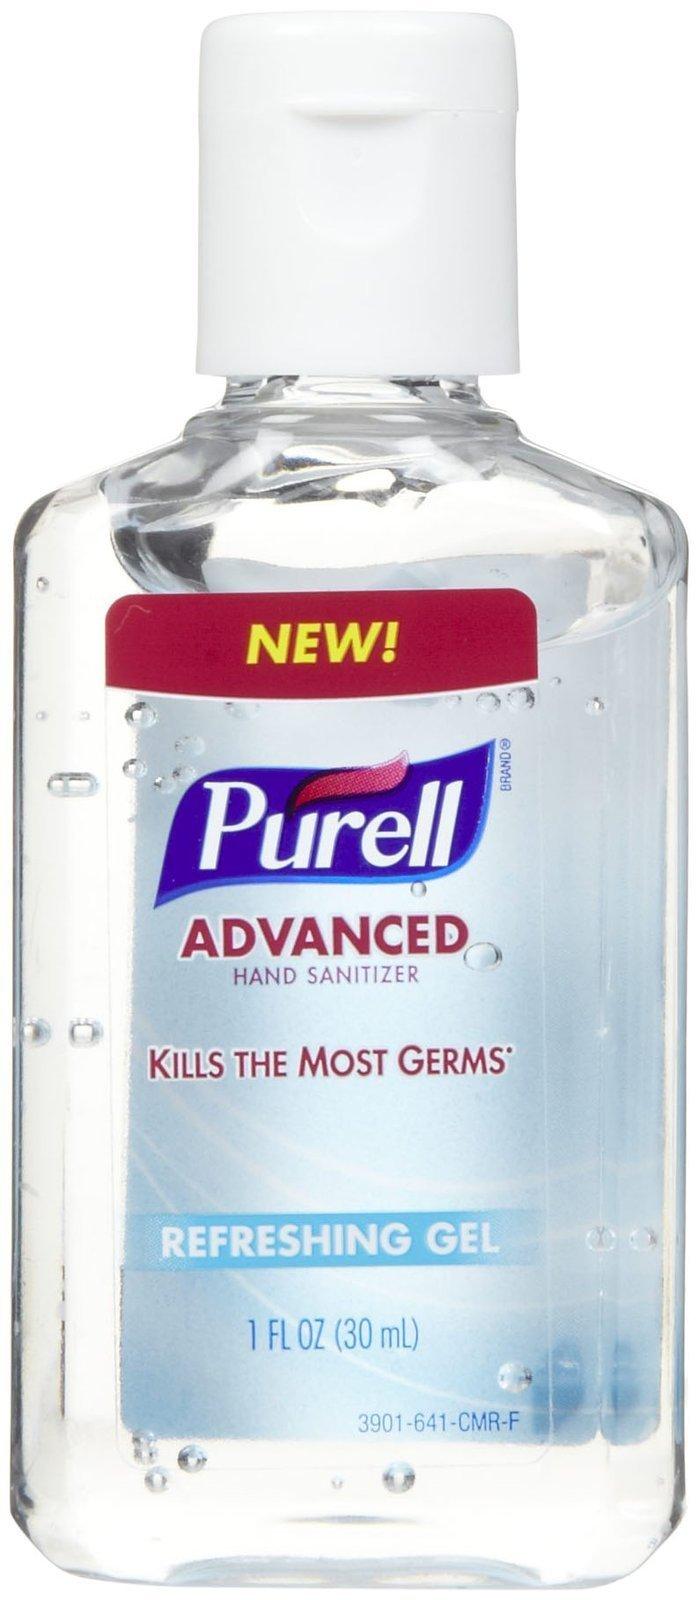 Purell Advanced Hand Sanitizer Refreshing Gel, 1 Fl Oz